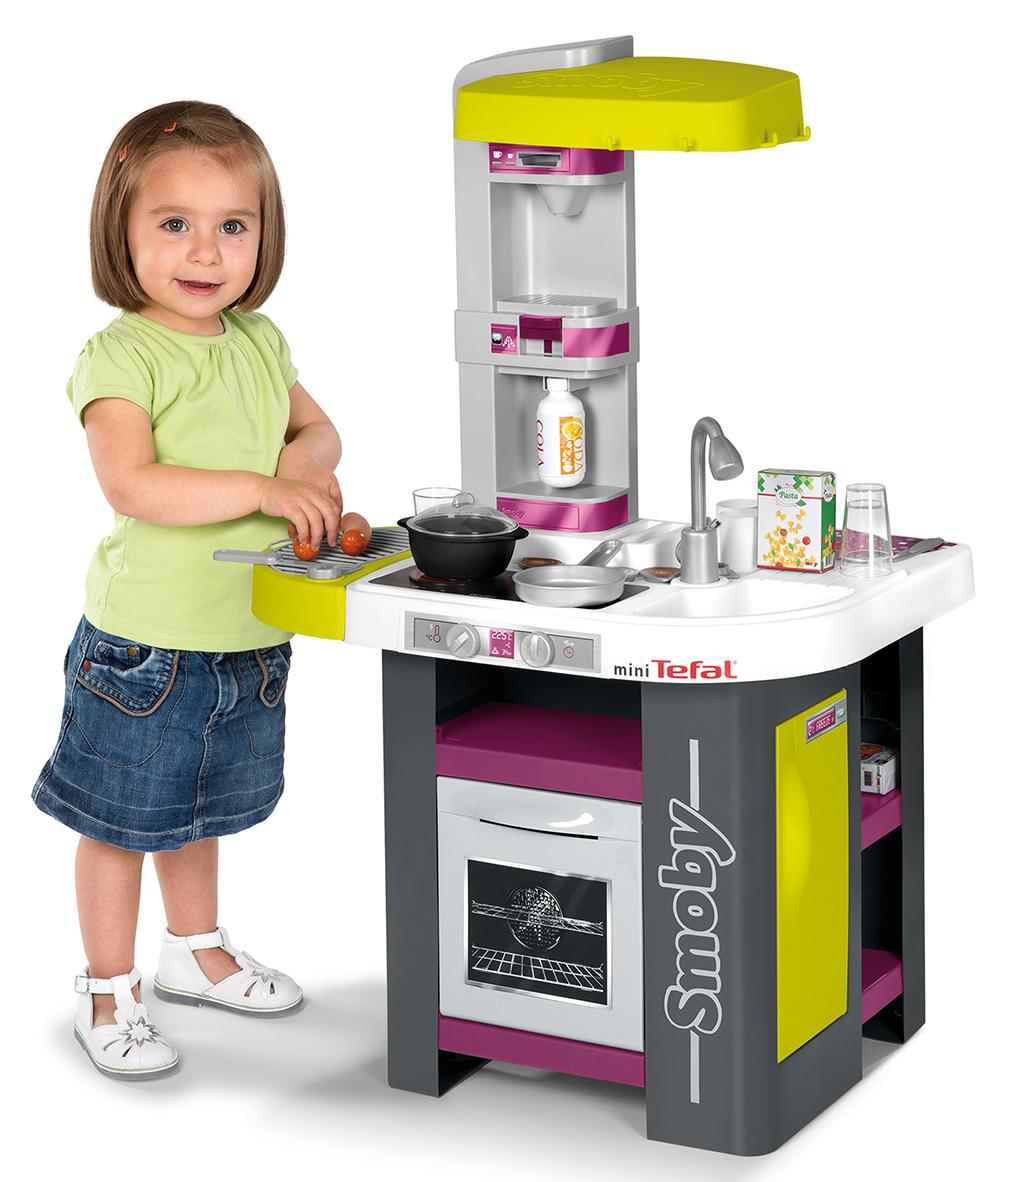 smoby 024128 jeu d 39 imitation tefal cuisine studio. Black Bedroom Furniture Sets. Home Design Ideas